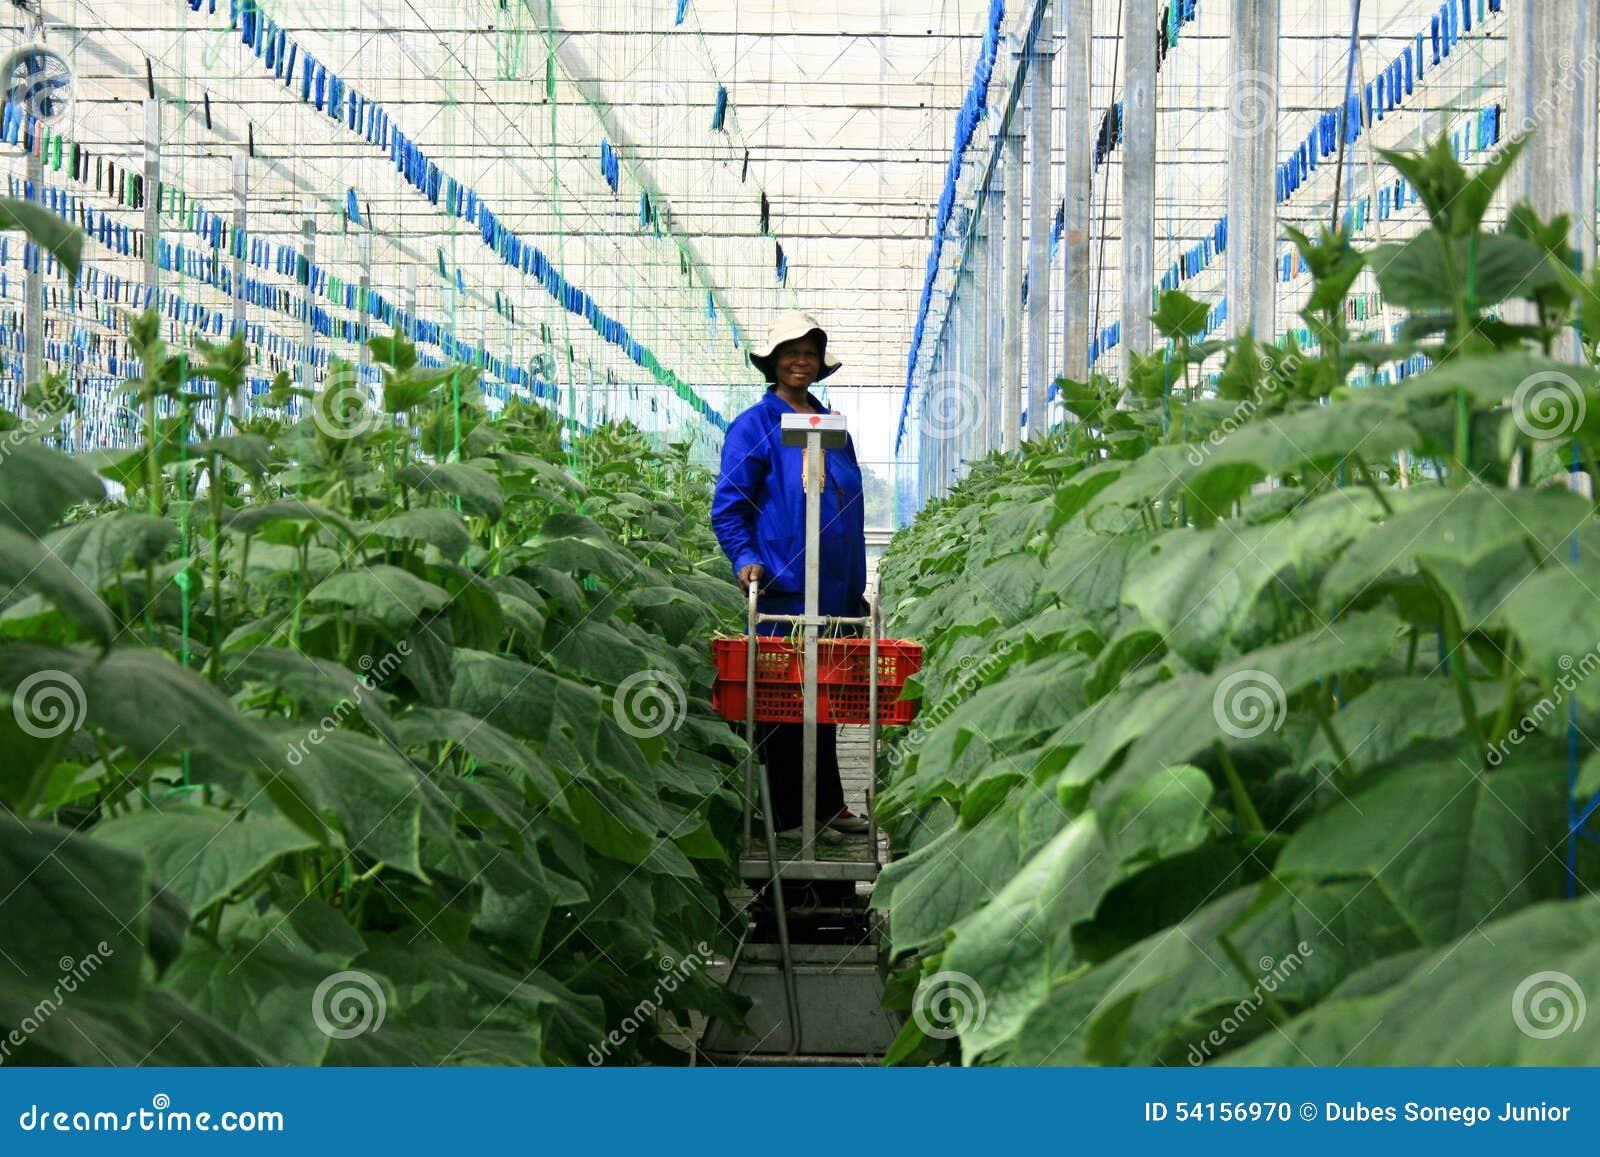 Plantation De Concombre De Serre Chaude Image éditorial ...